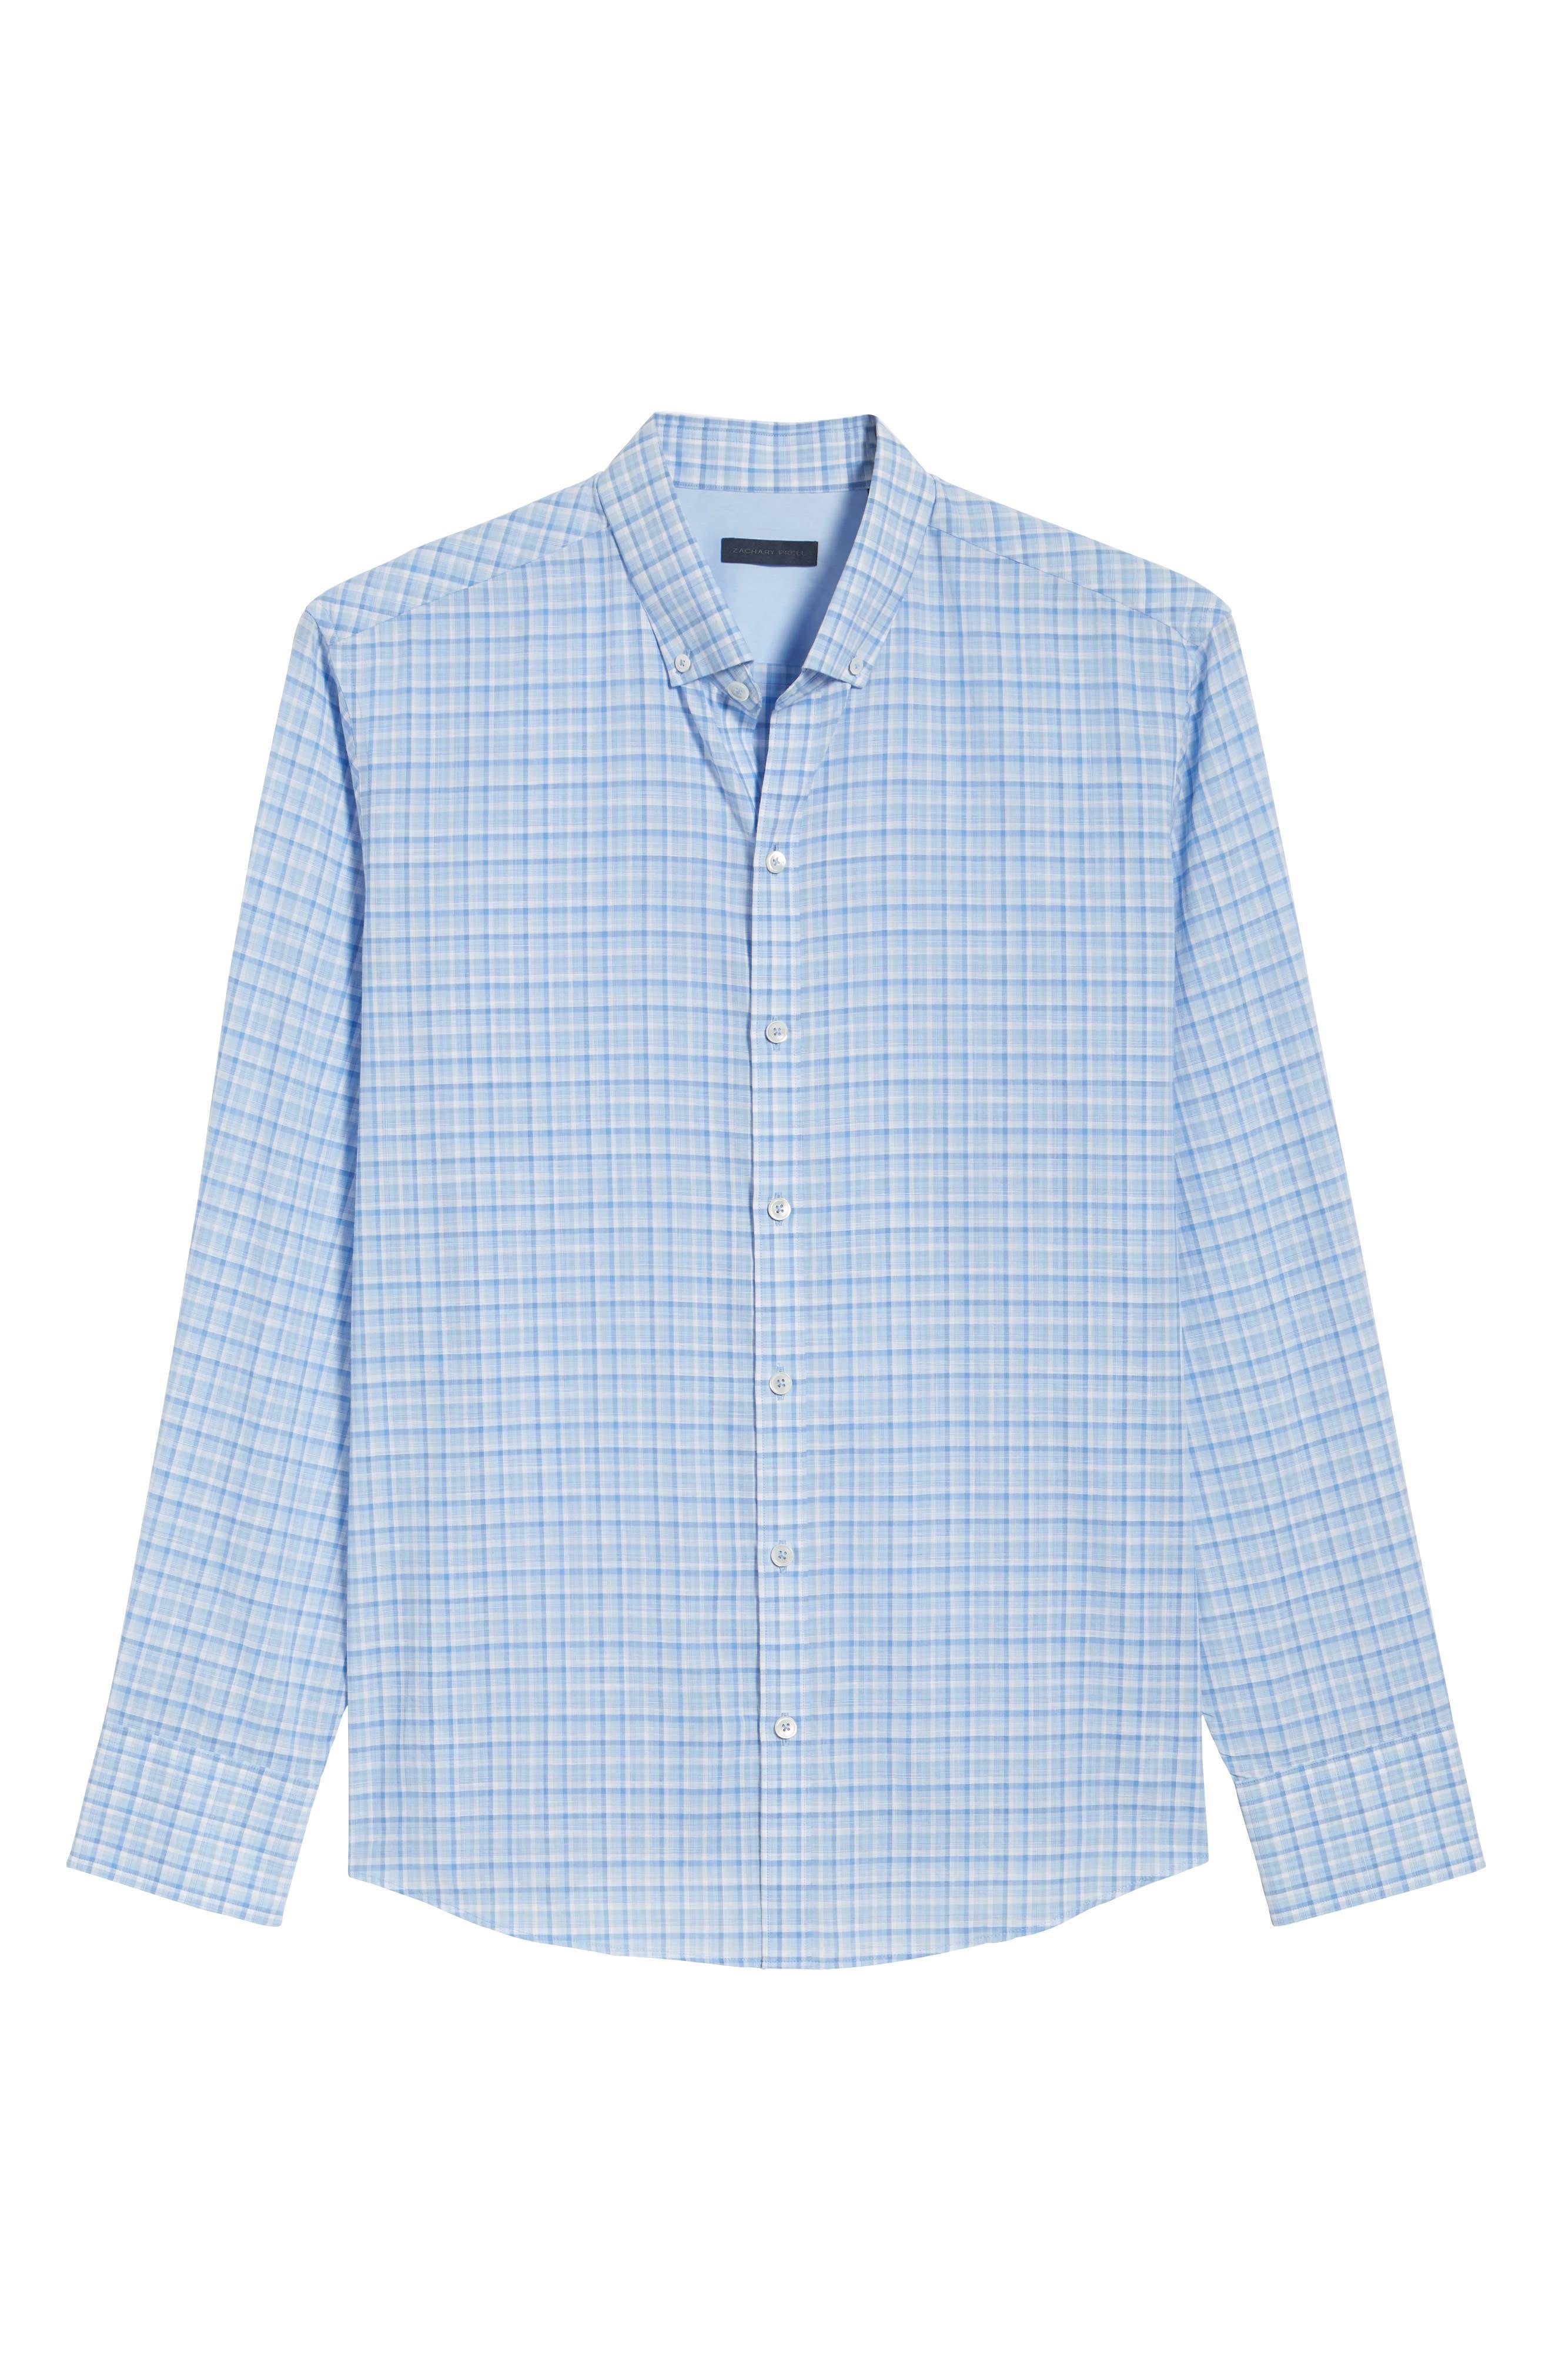 Jian Regular Fit Sport Shirt,                             Alternate thumbnail 6, color,                             Sky